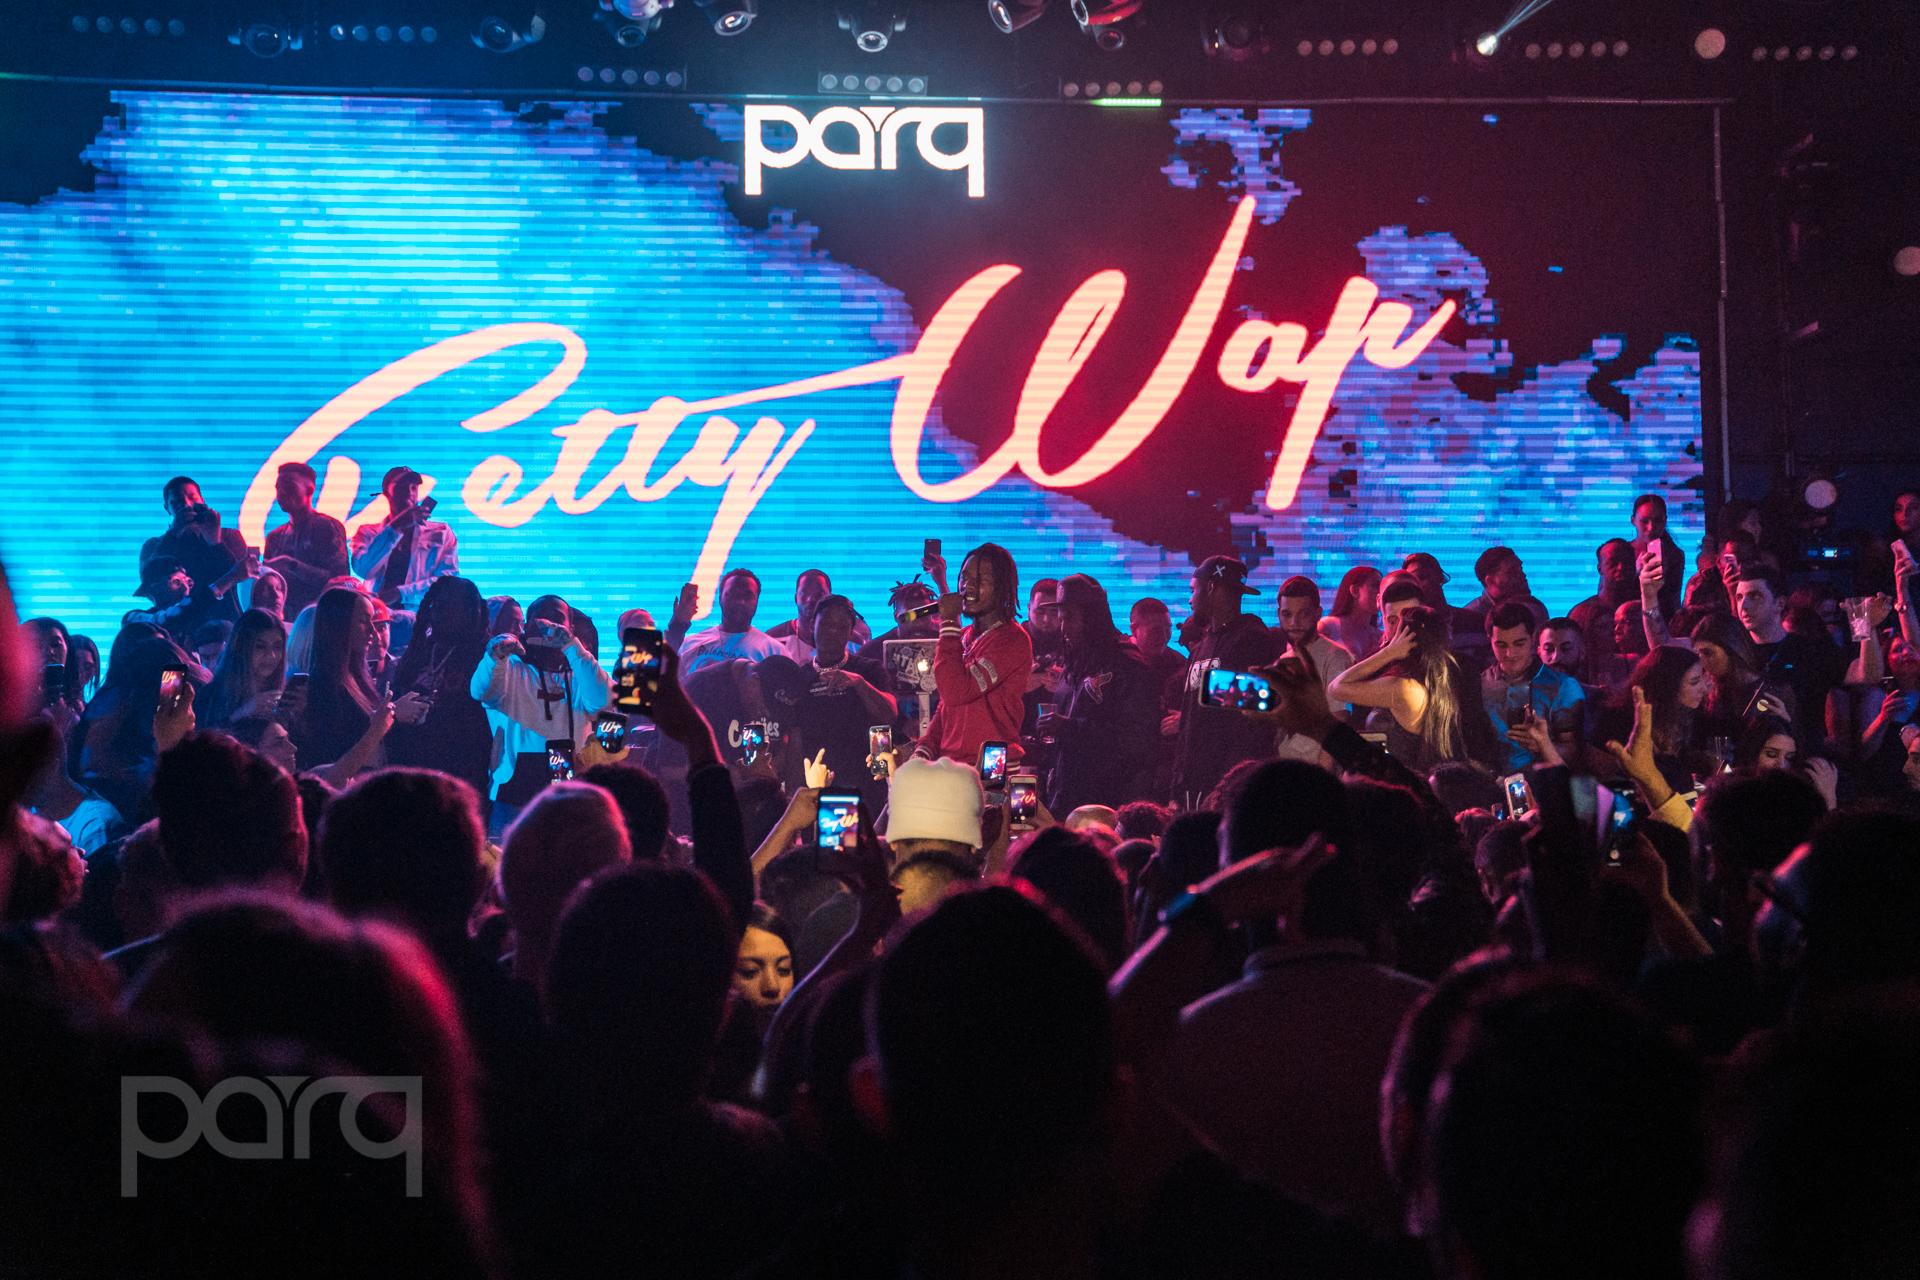 02.03.18 Parq - Fetty Wap-27.jpg